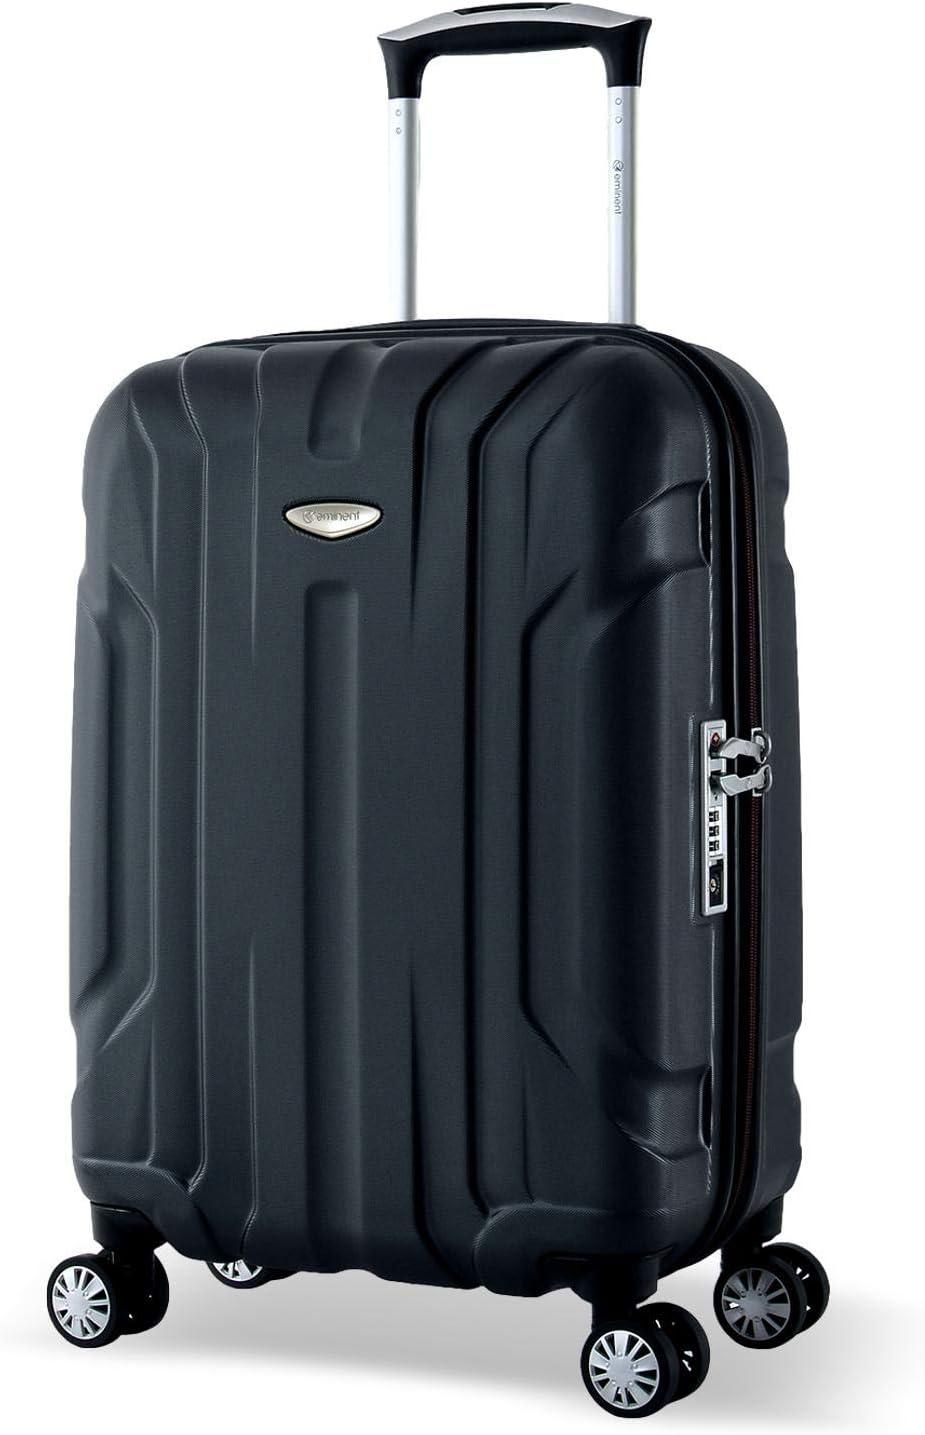 Eminent Maleta Cabina X-Tec 55cm 40L Ultra Ligera con 4 Ruedas multidireccionales Policarbonato Rígido, Candado TSA & Mango telescópico Negro